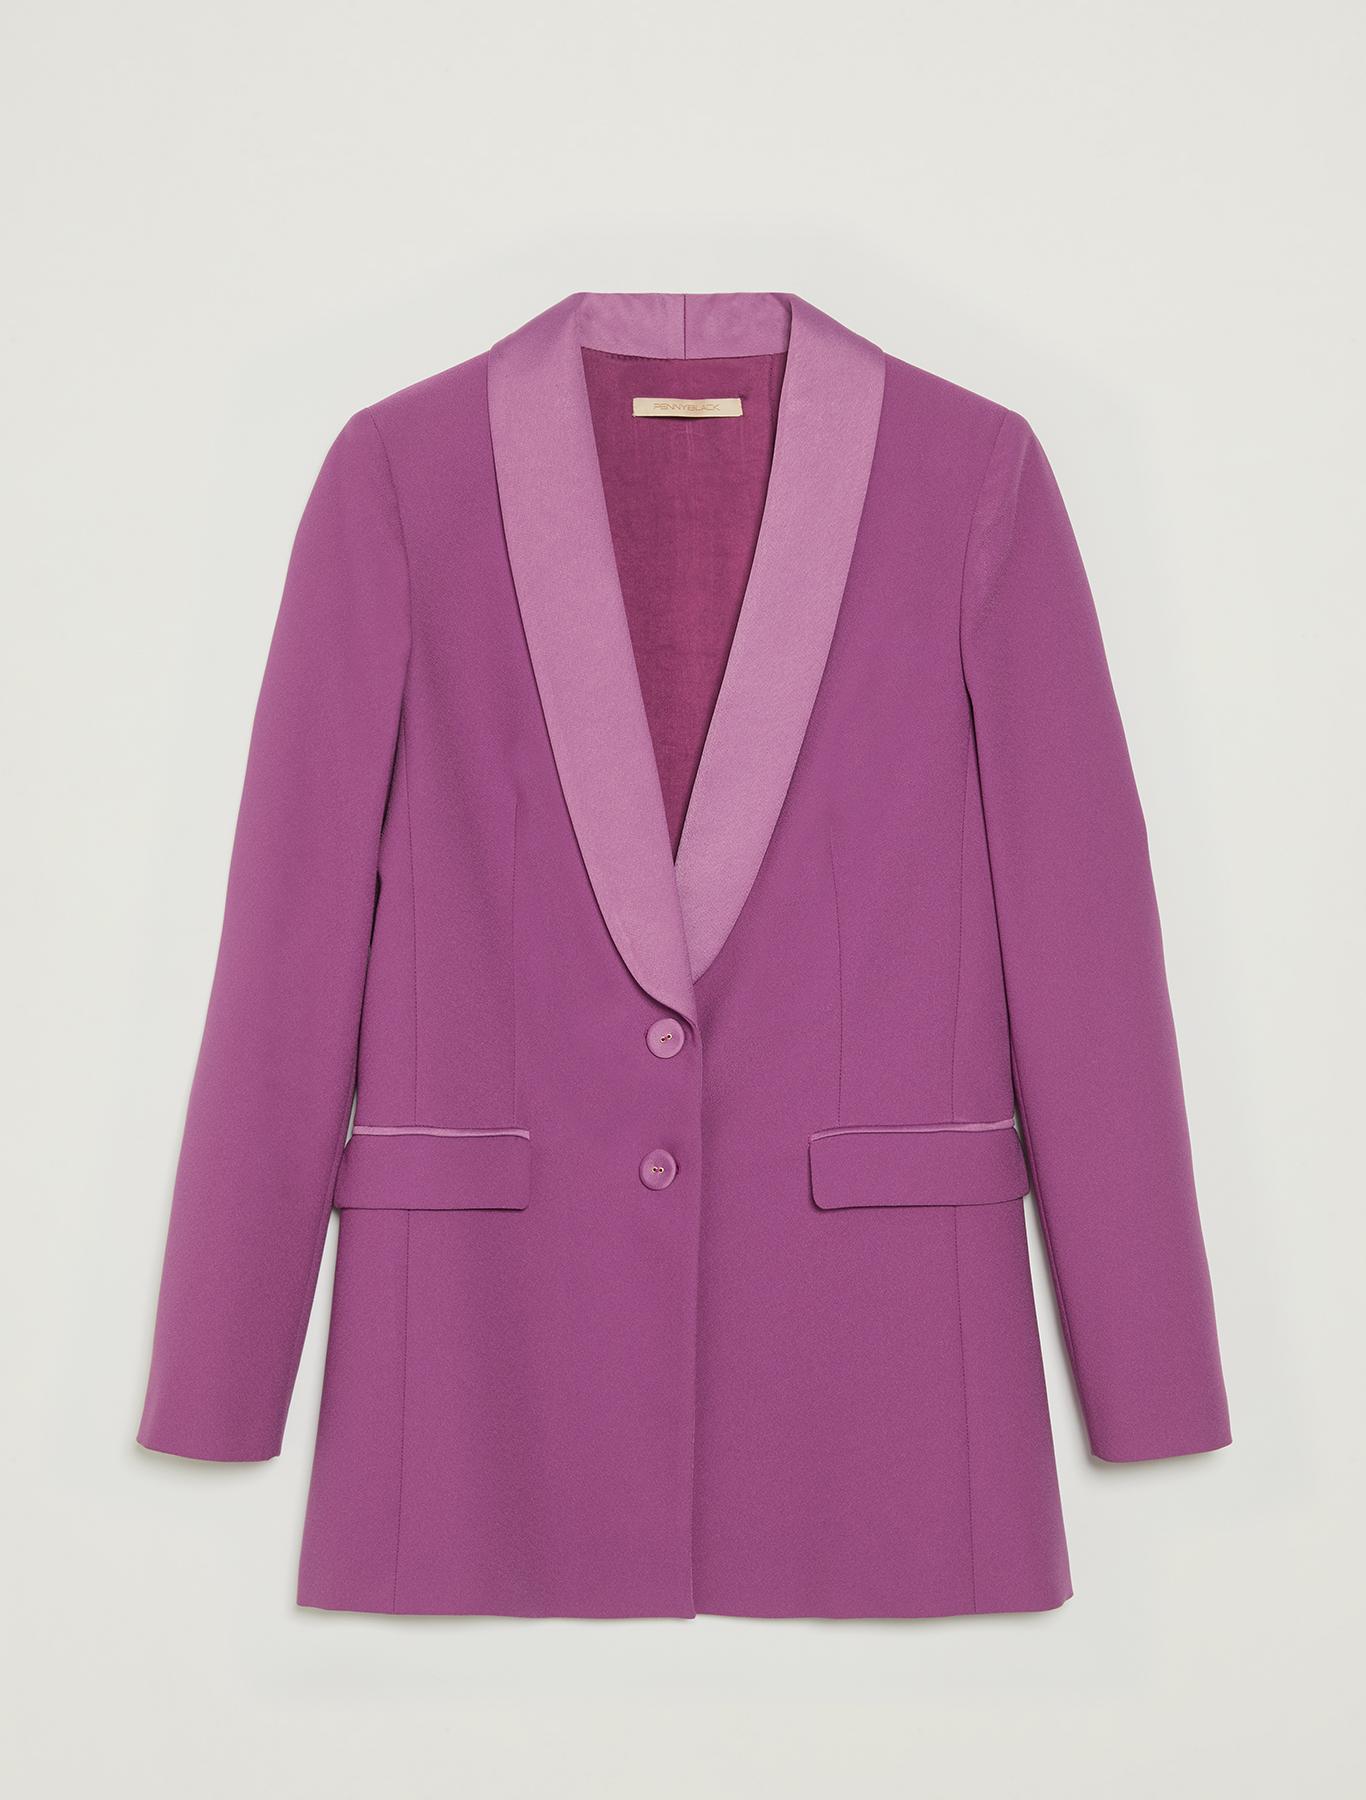 Smoking jacket with satin lapels - purple - pennyblack